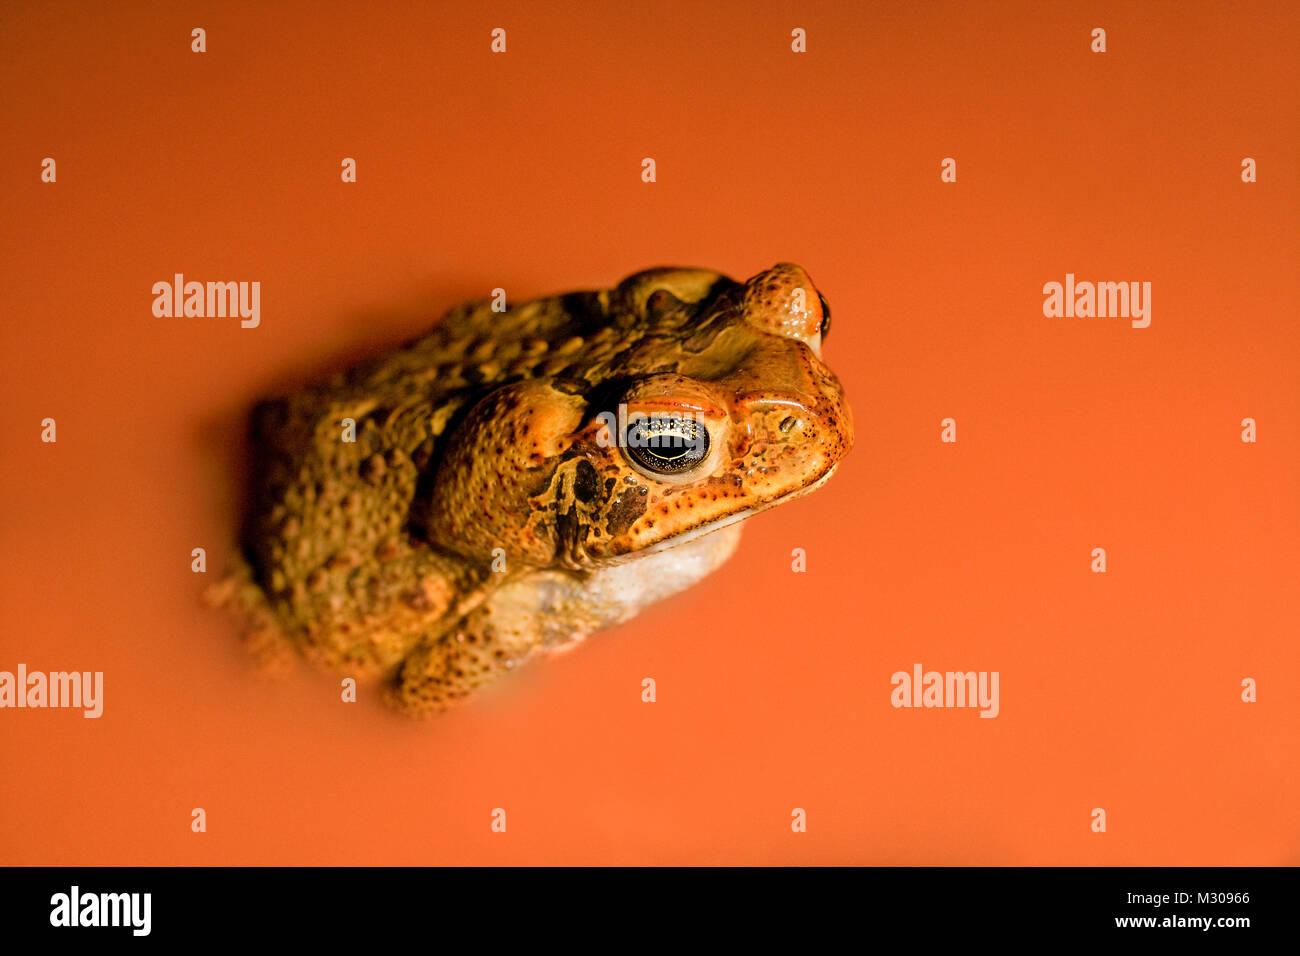 Suriname, Brownsweg, Brownsberg National Park. Cane Toad (Bufo Marinus). In laterite pool. - Stock Image